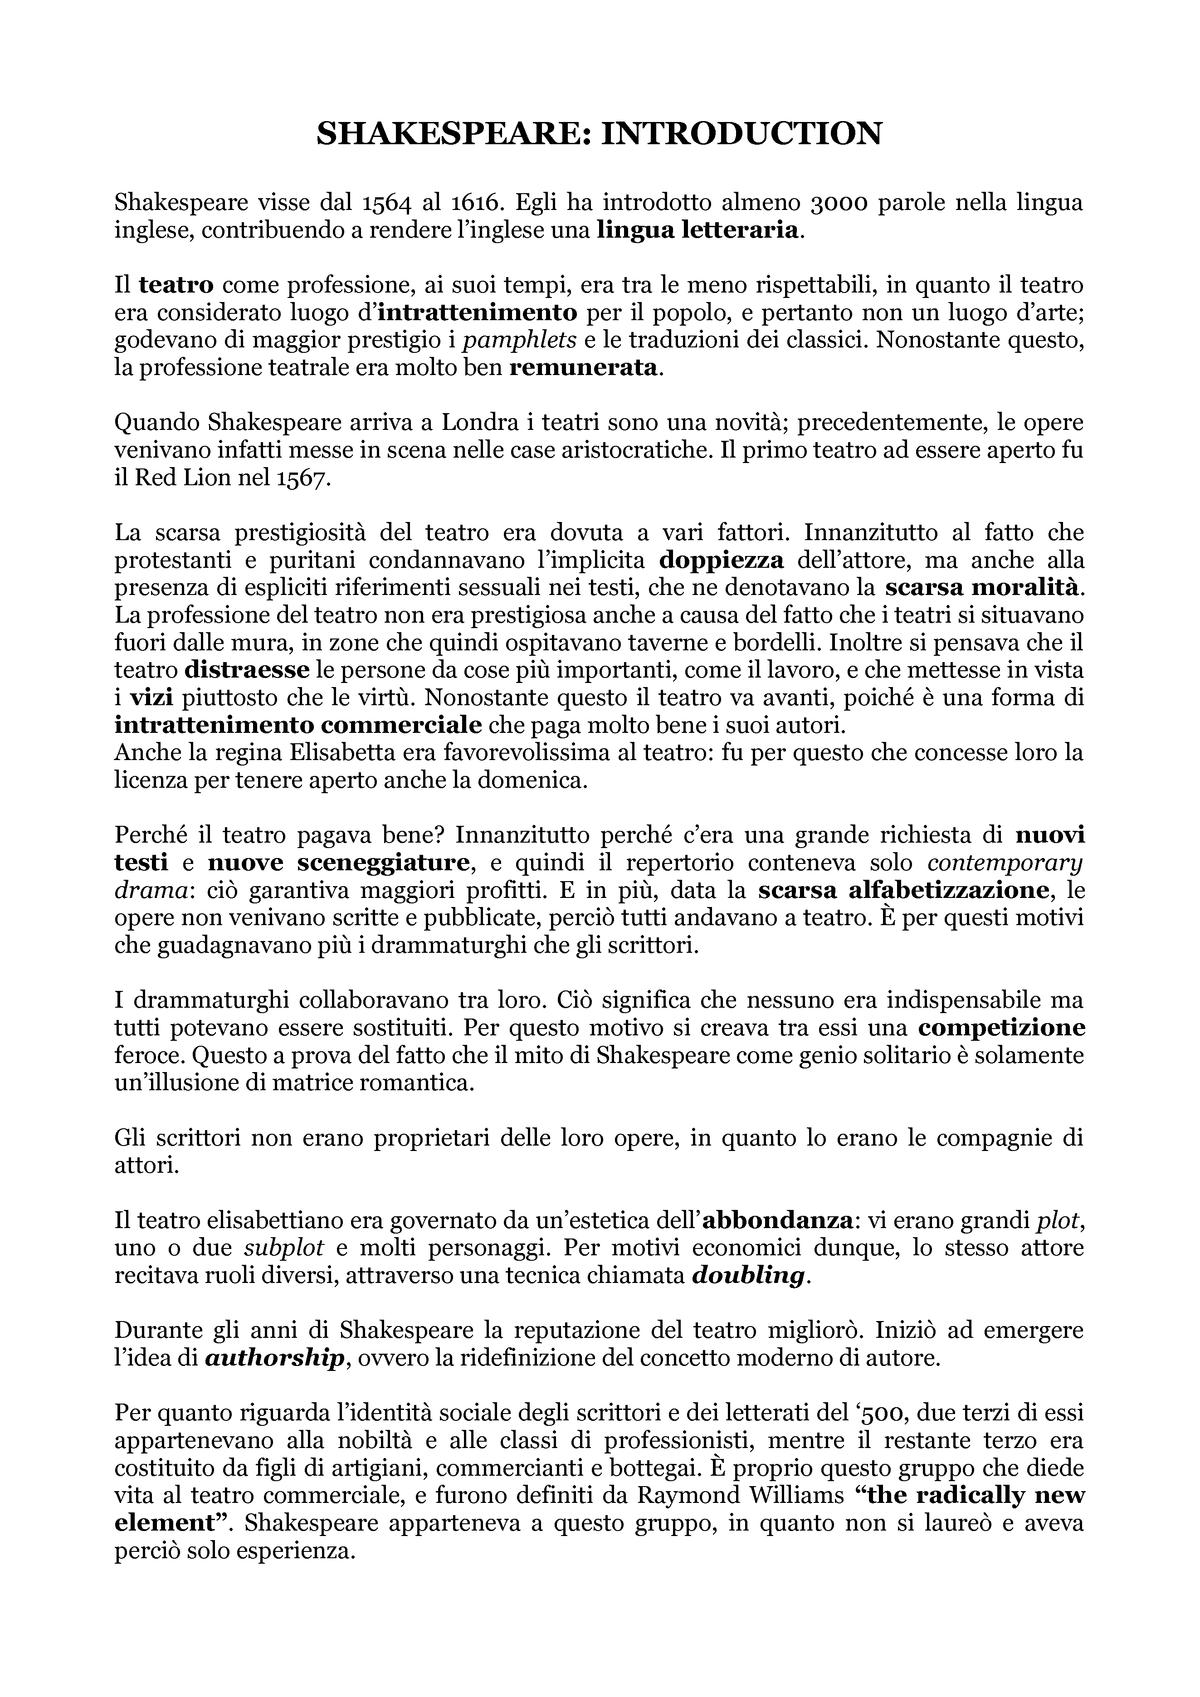 Letteratura Inglese 1 Appunti Tutte Unimc Studocu